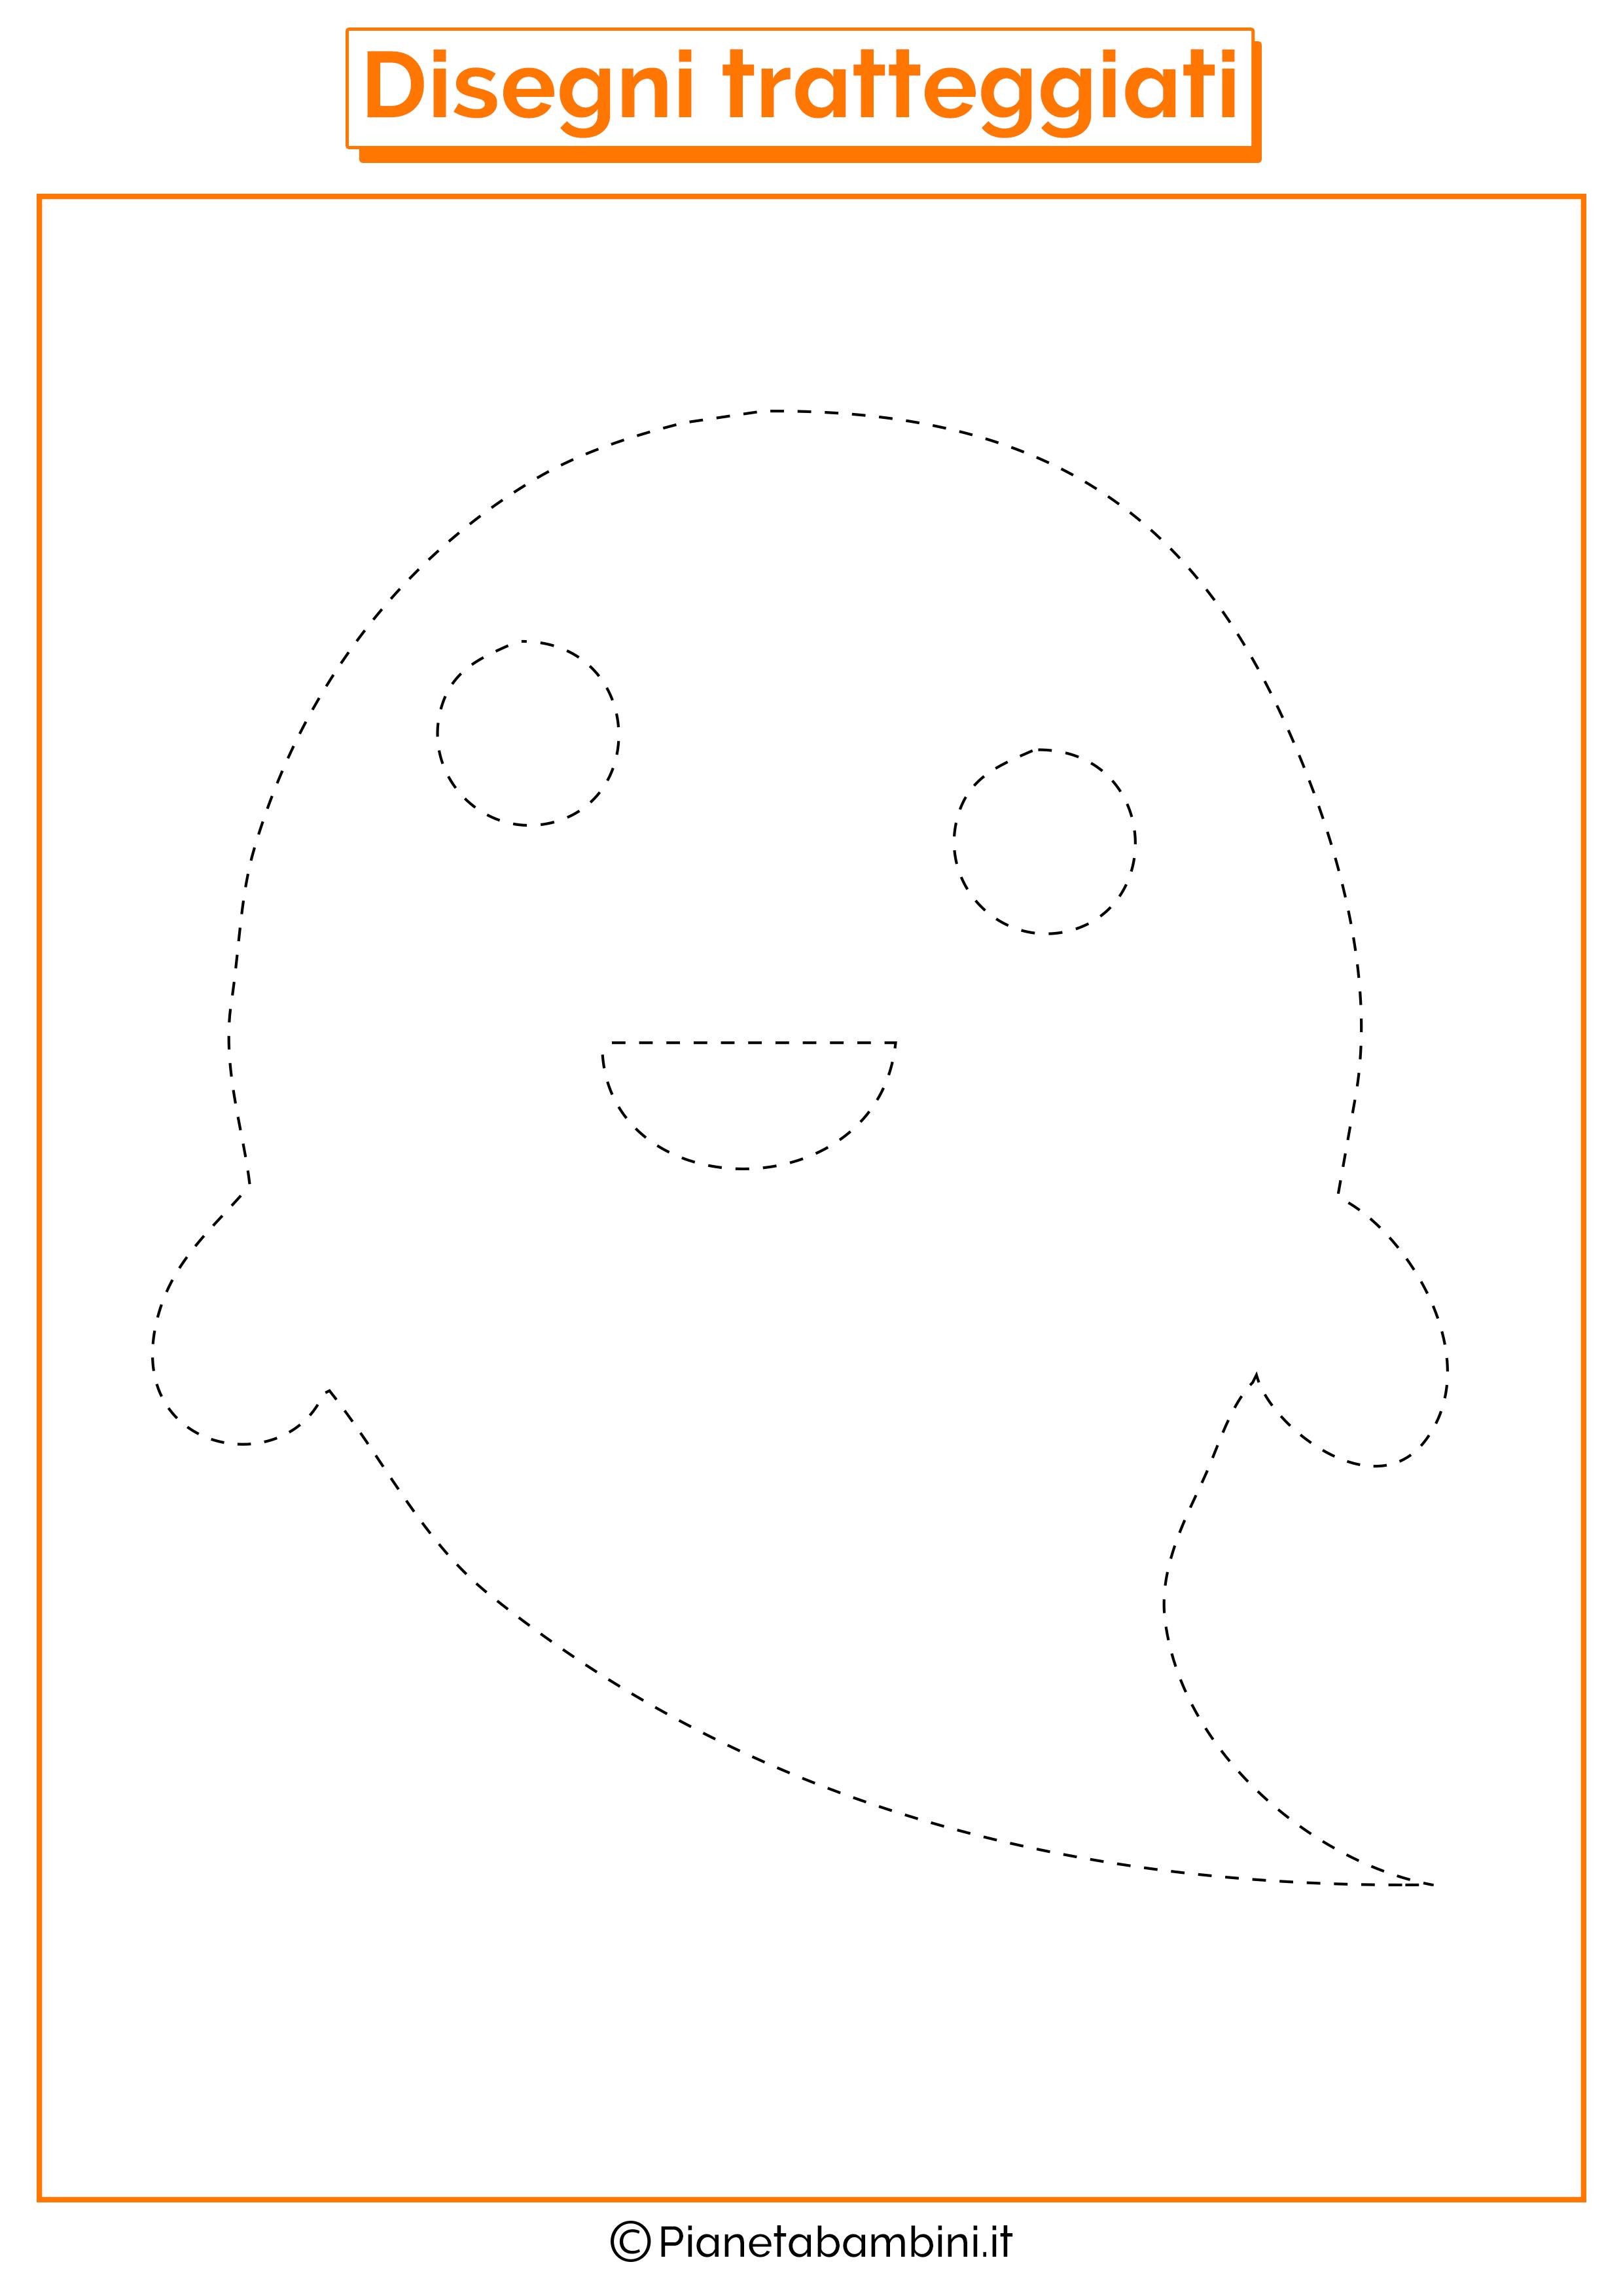 Disegni-Tratteggiati-Fantasma